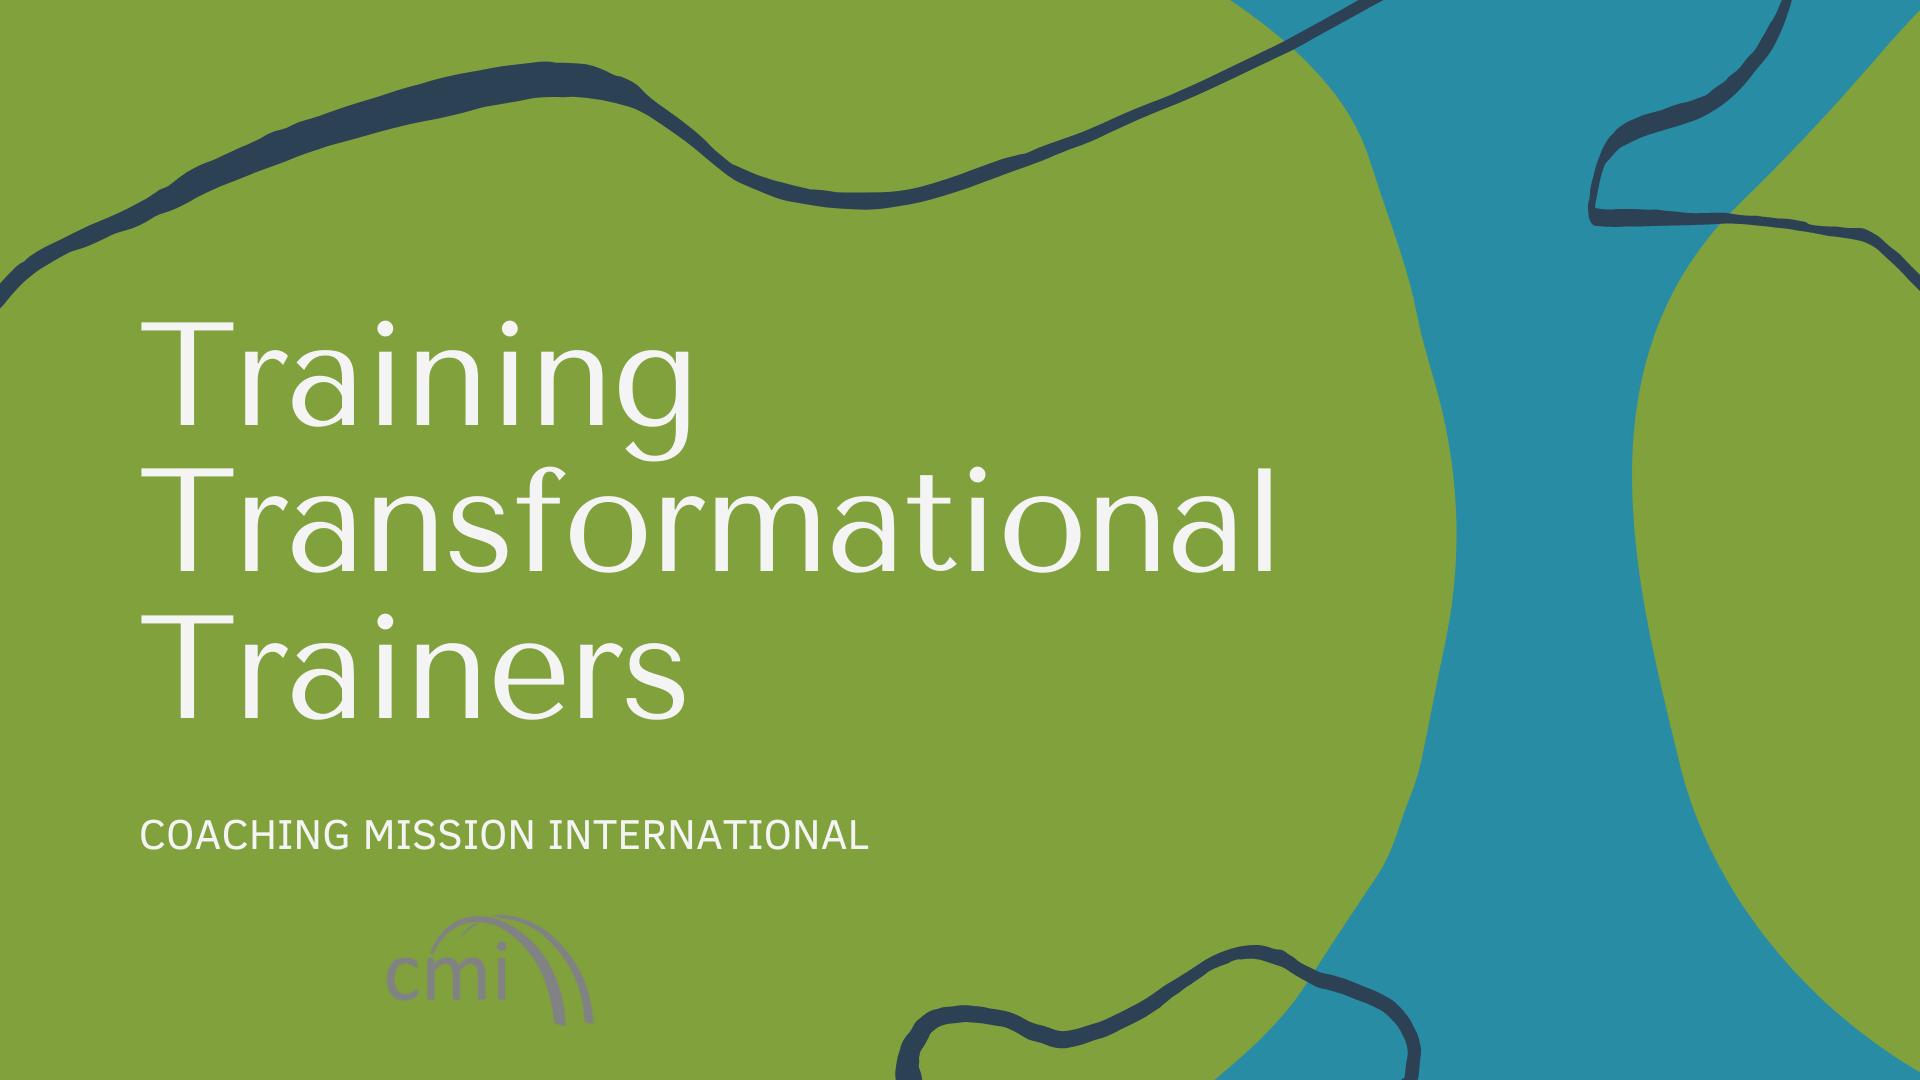 Training Transformational Trainers